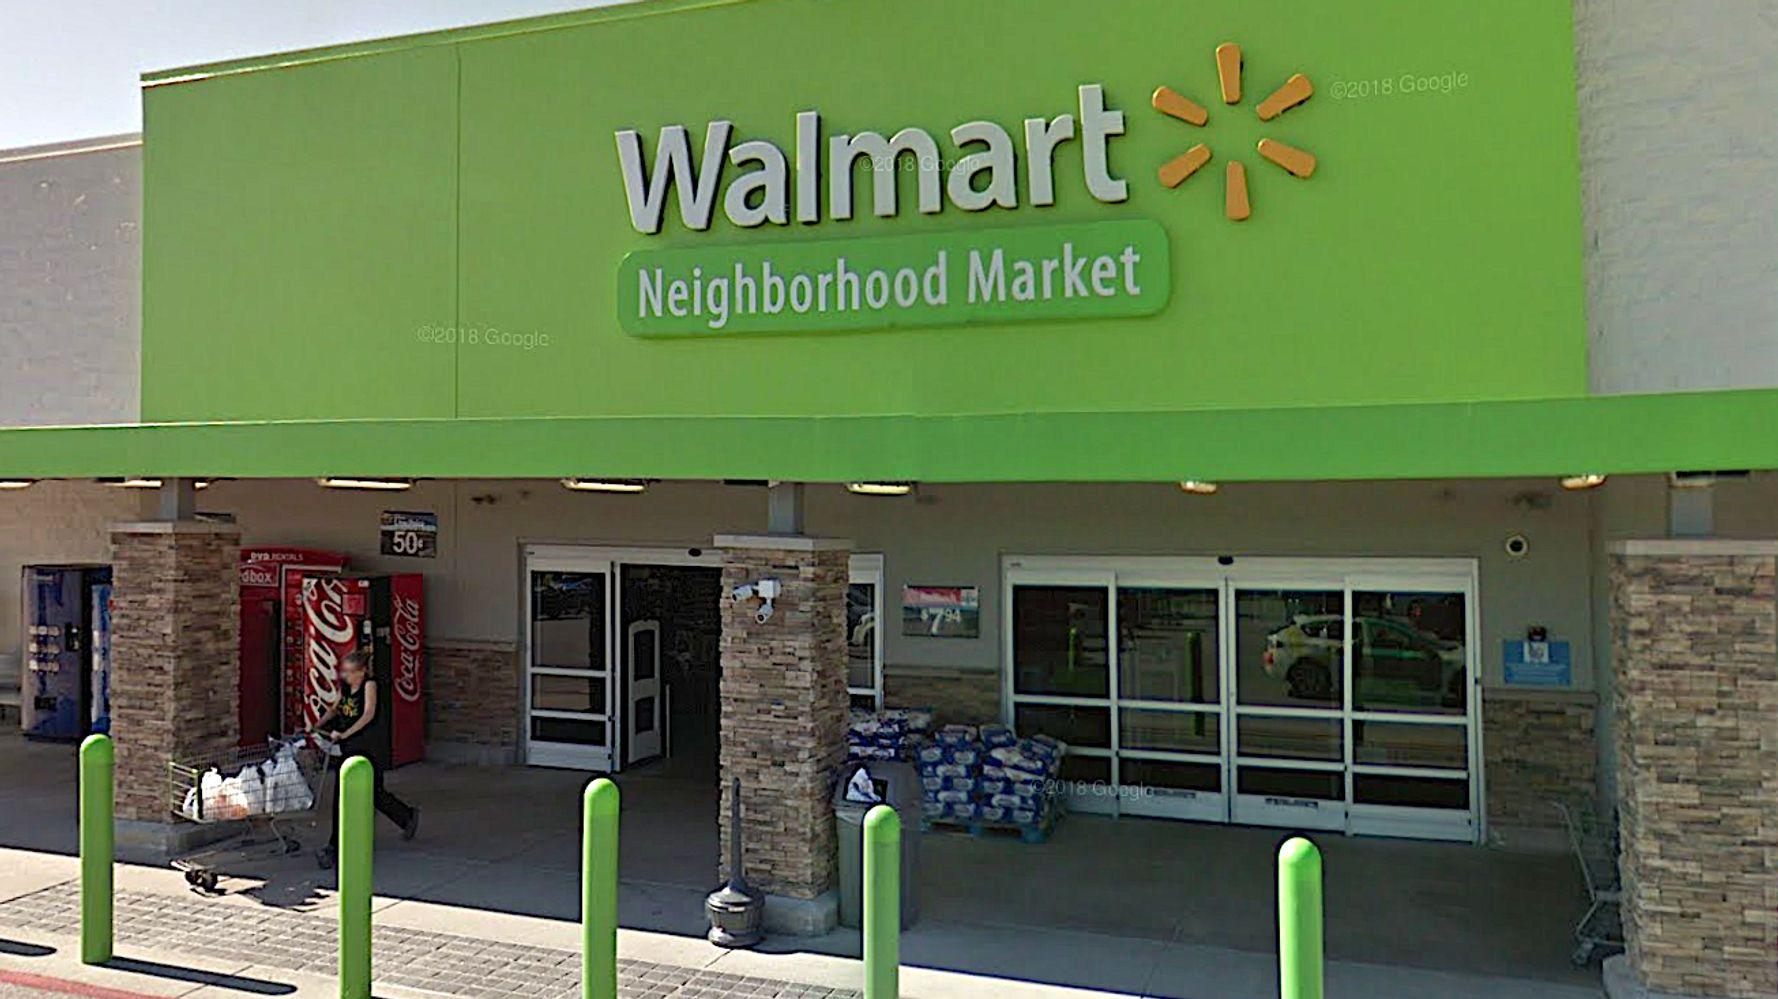 Armed Man Walked Into Missouri Walmart With Ammo, Body Armor, Police